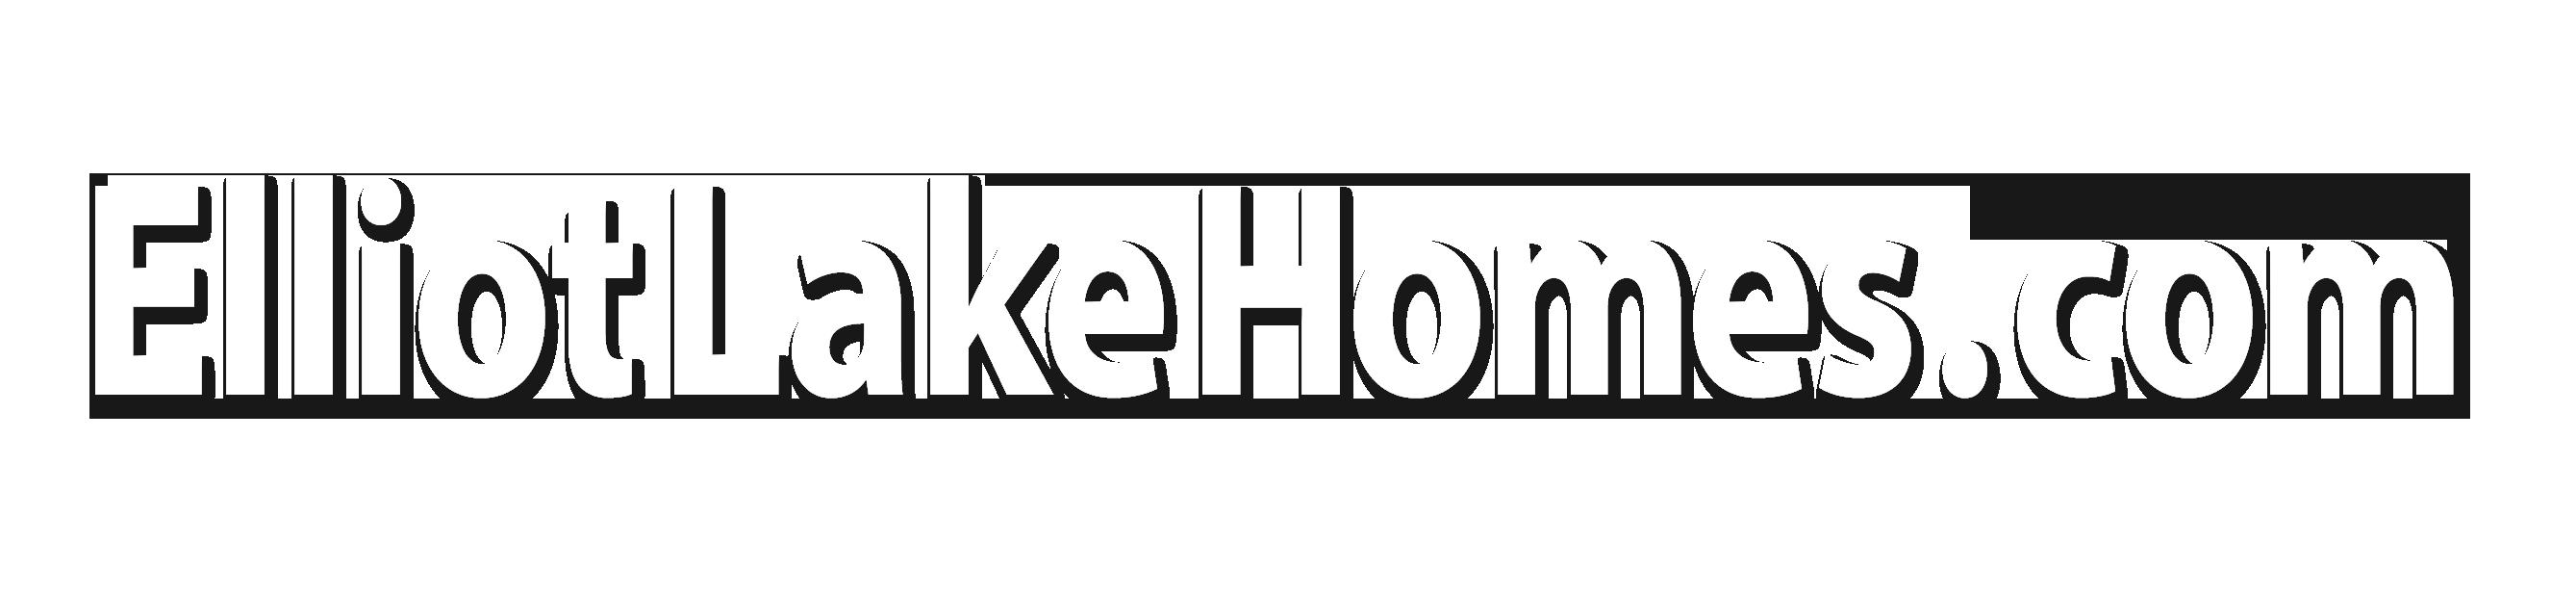 elliotlakehomes.com